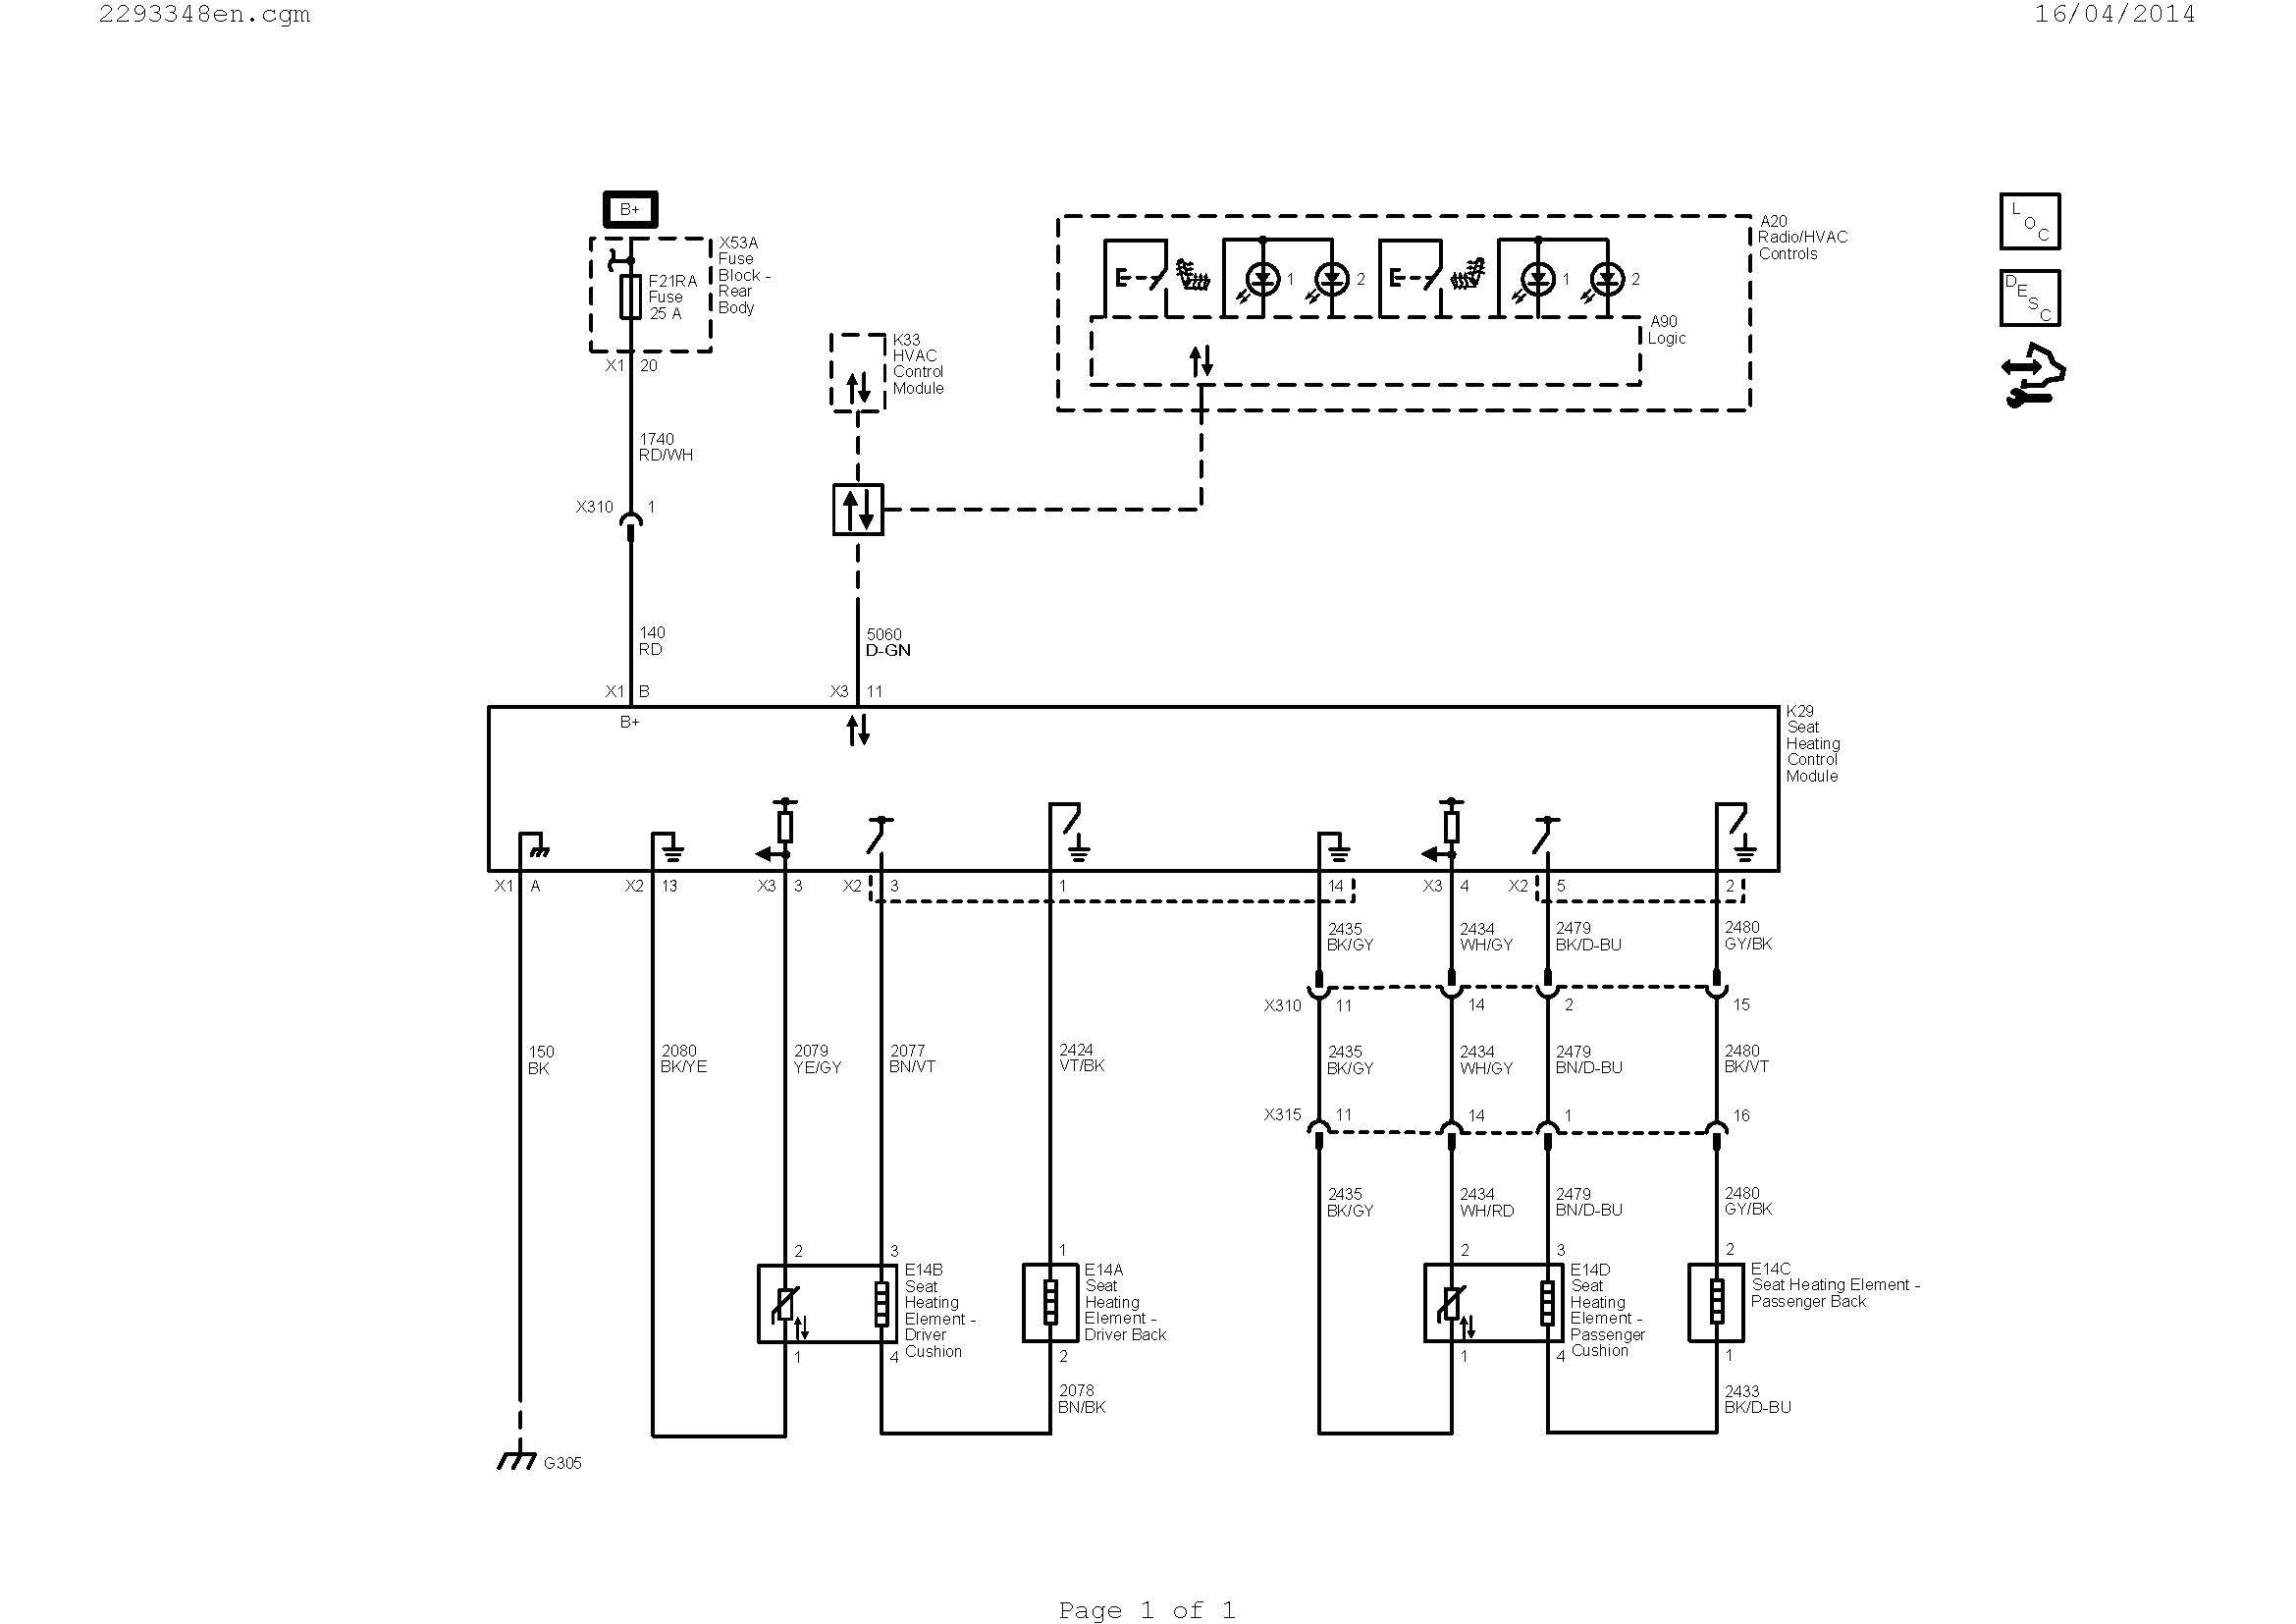 Actuator Wiring Diagram Rbb Hq Actuator Wiring Diagrams Schematic Diagram